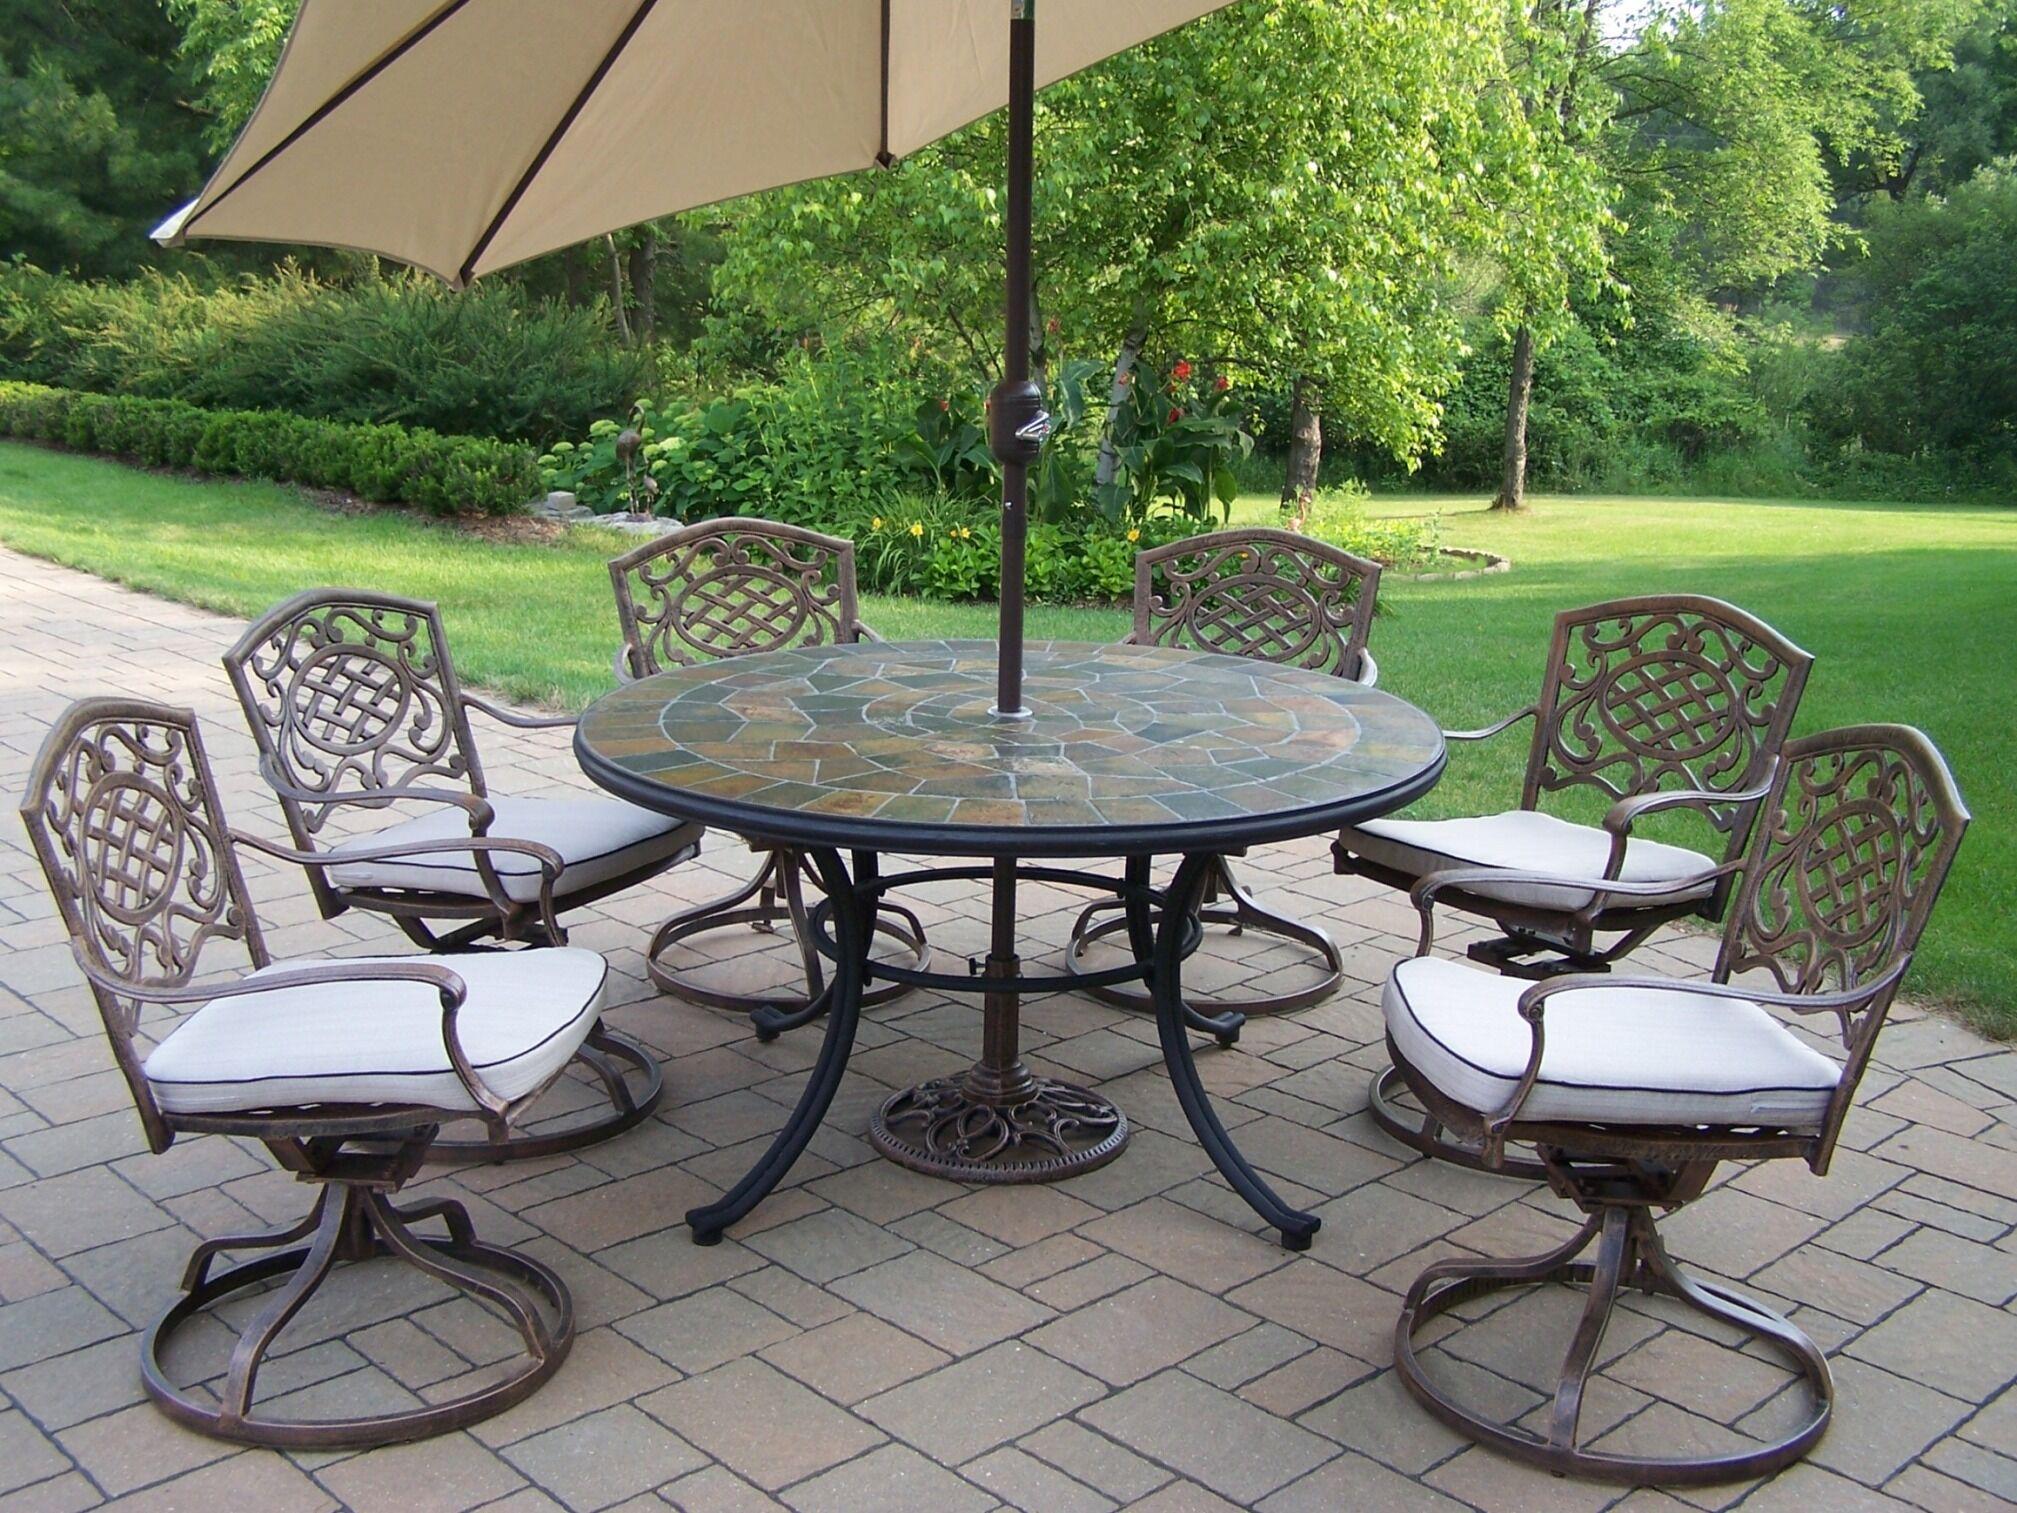 Stone Art Dining Set with Cushions and Umbrella Umbrella Color: Beige